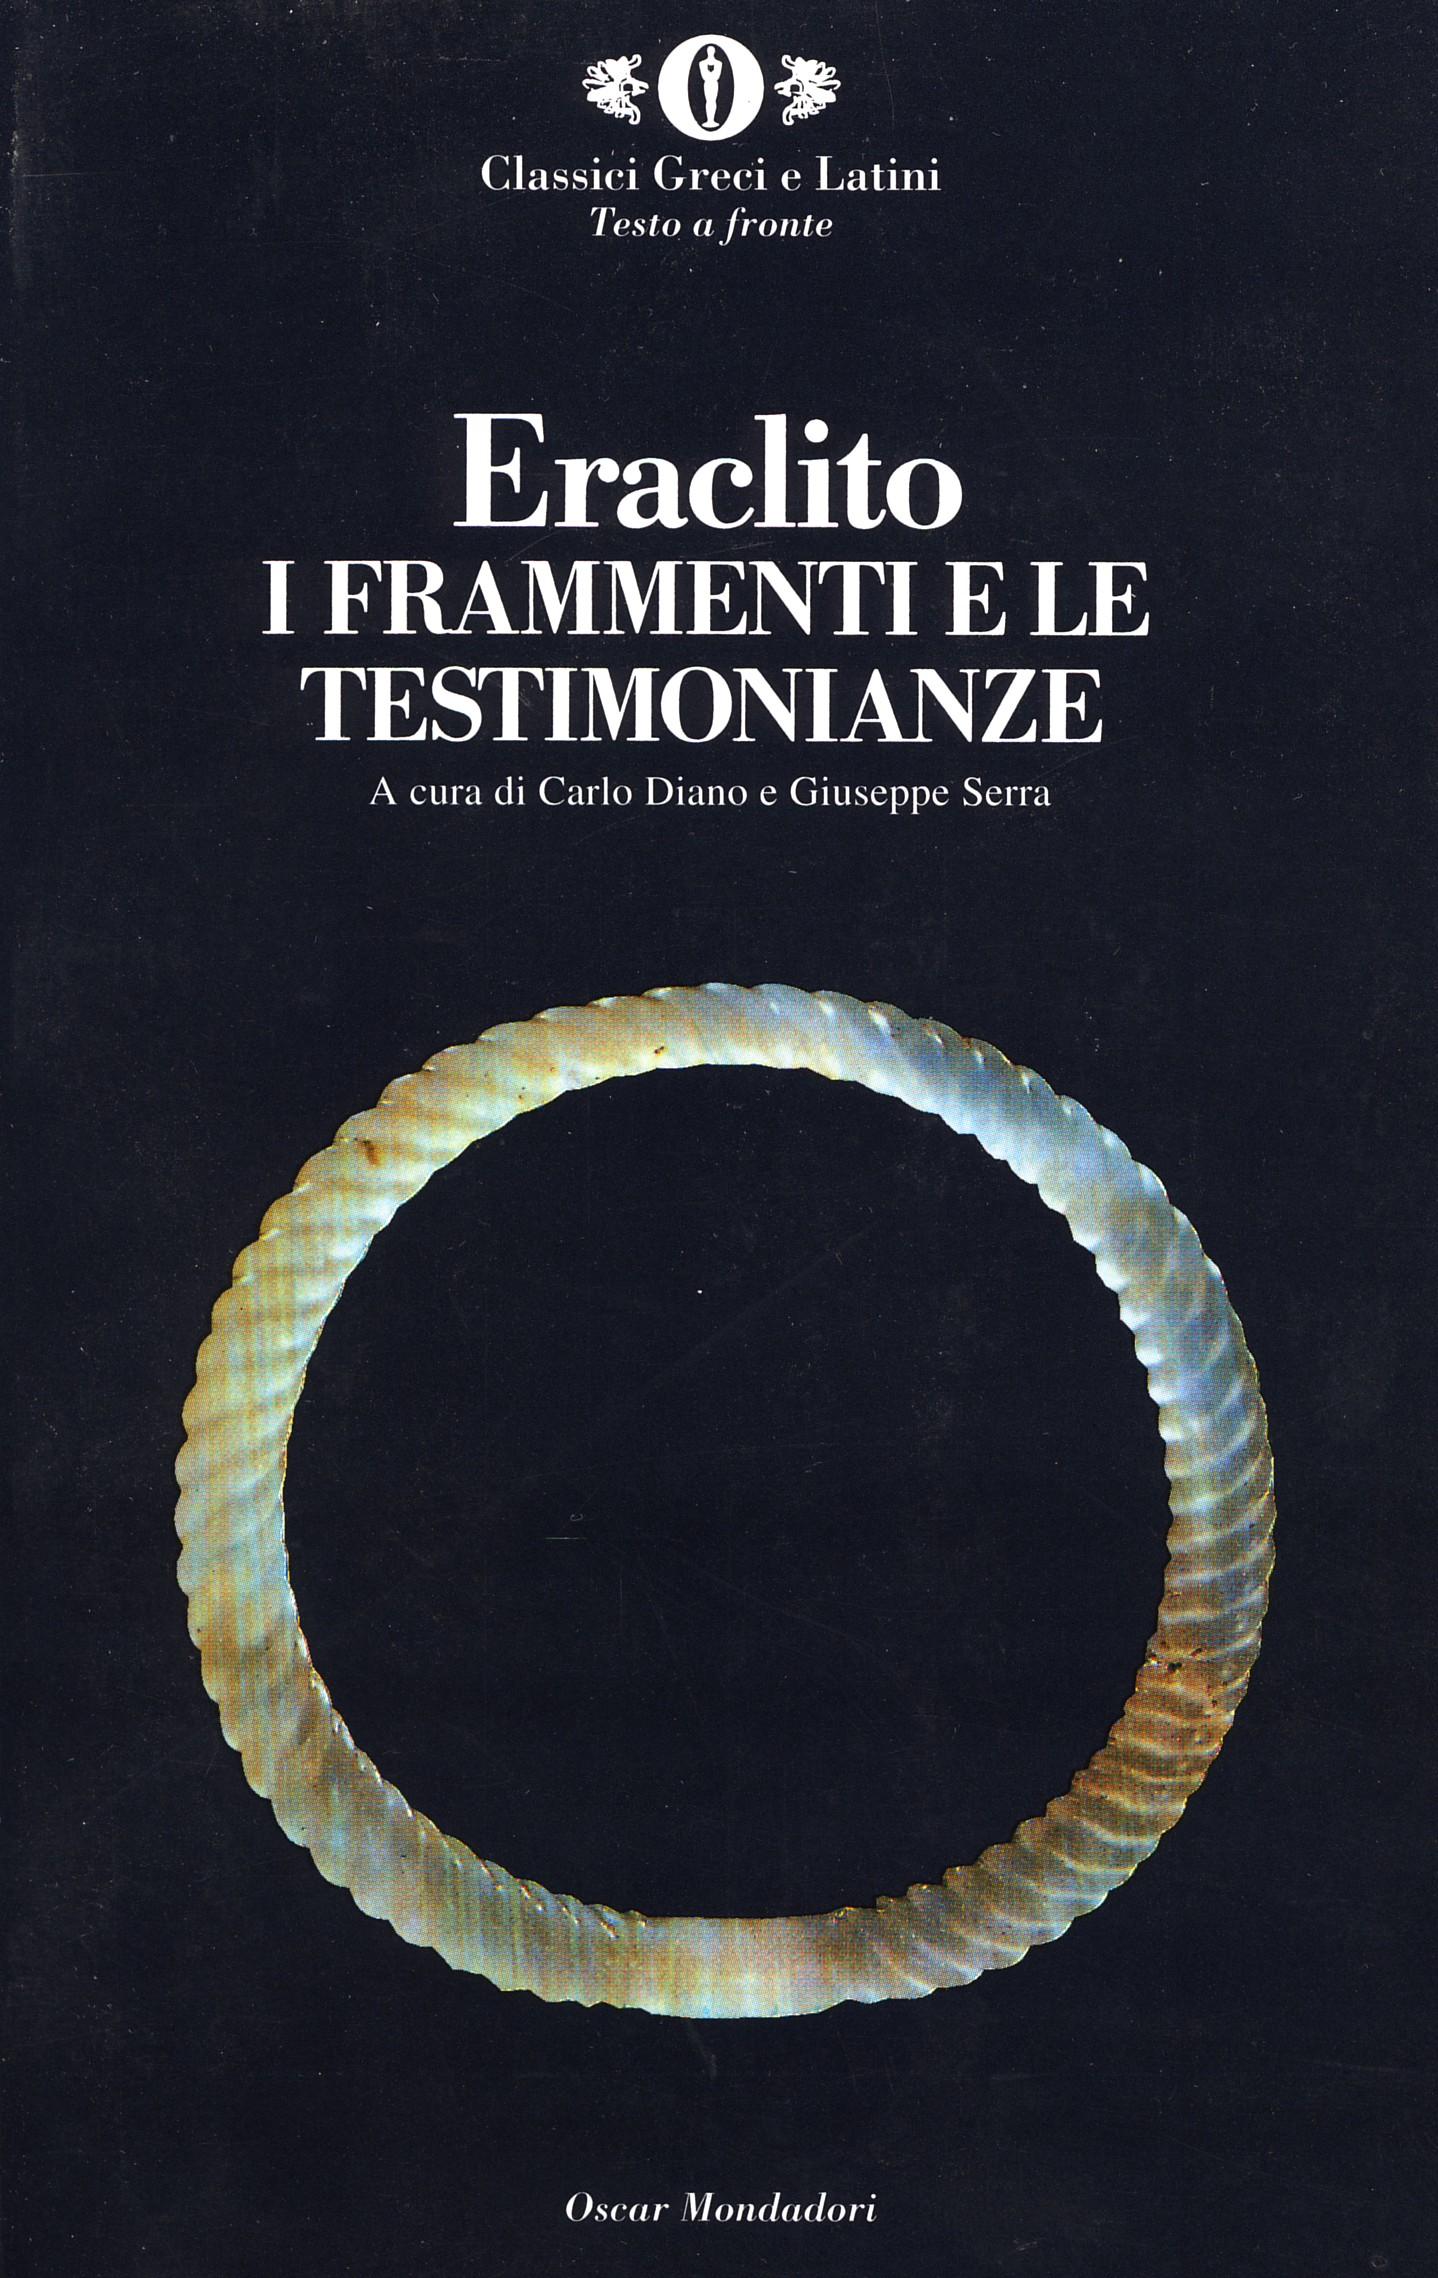 I frammenti e le testimonianze